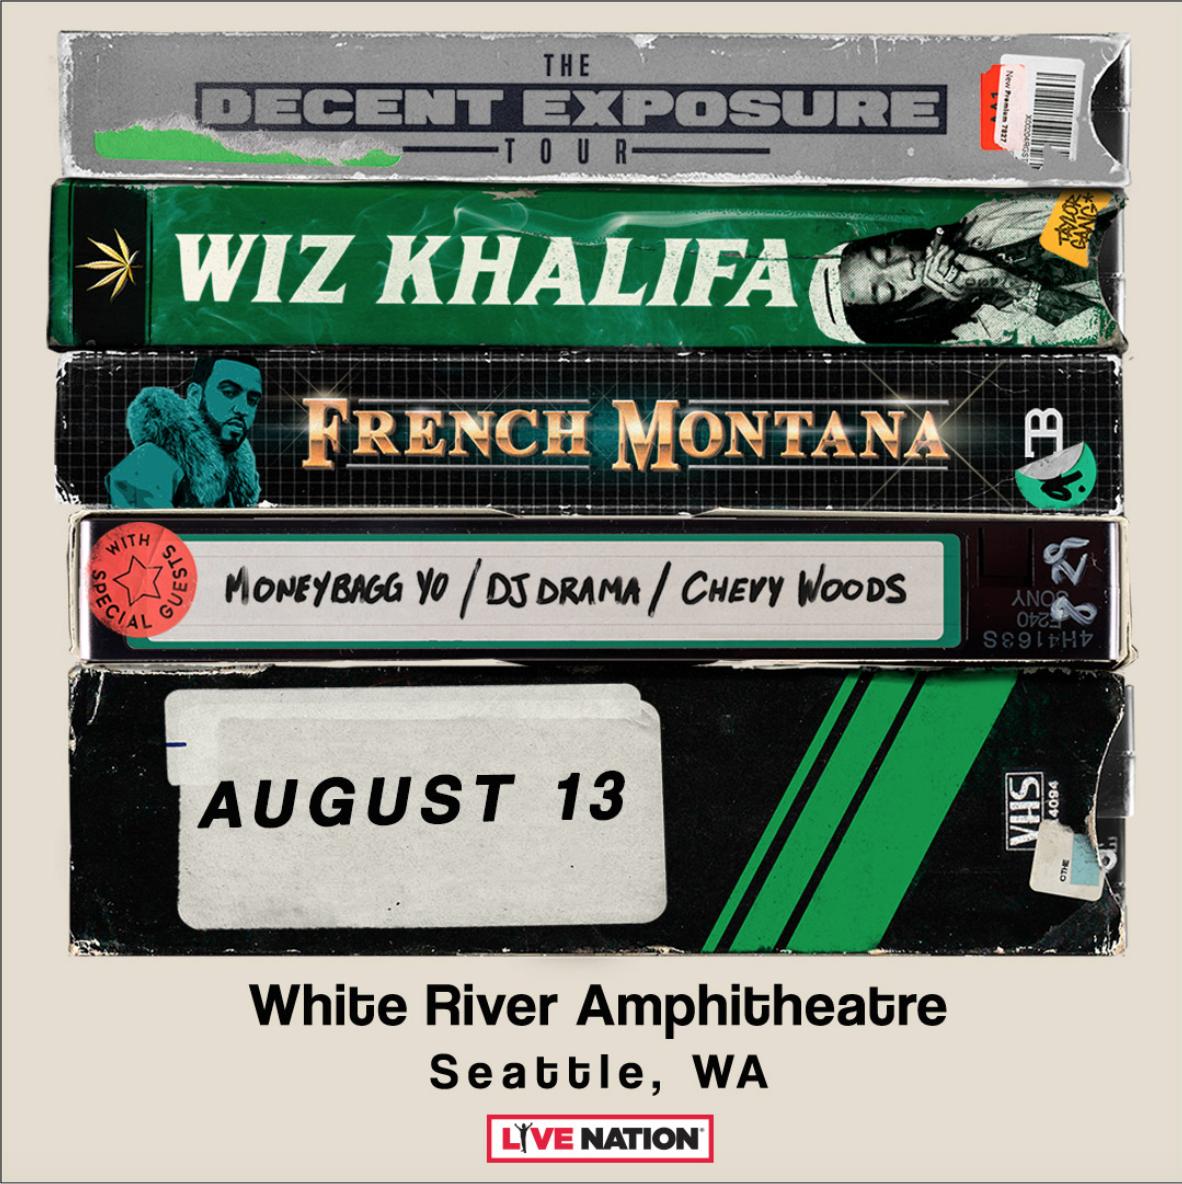 e2f640cfda84 Wiz Khalifa, French Montana, Moneybagg Yo, Chevy Woods, DJ Drama. The Decent  Exposure Tour